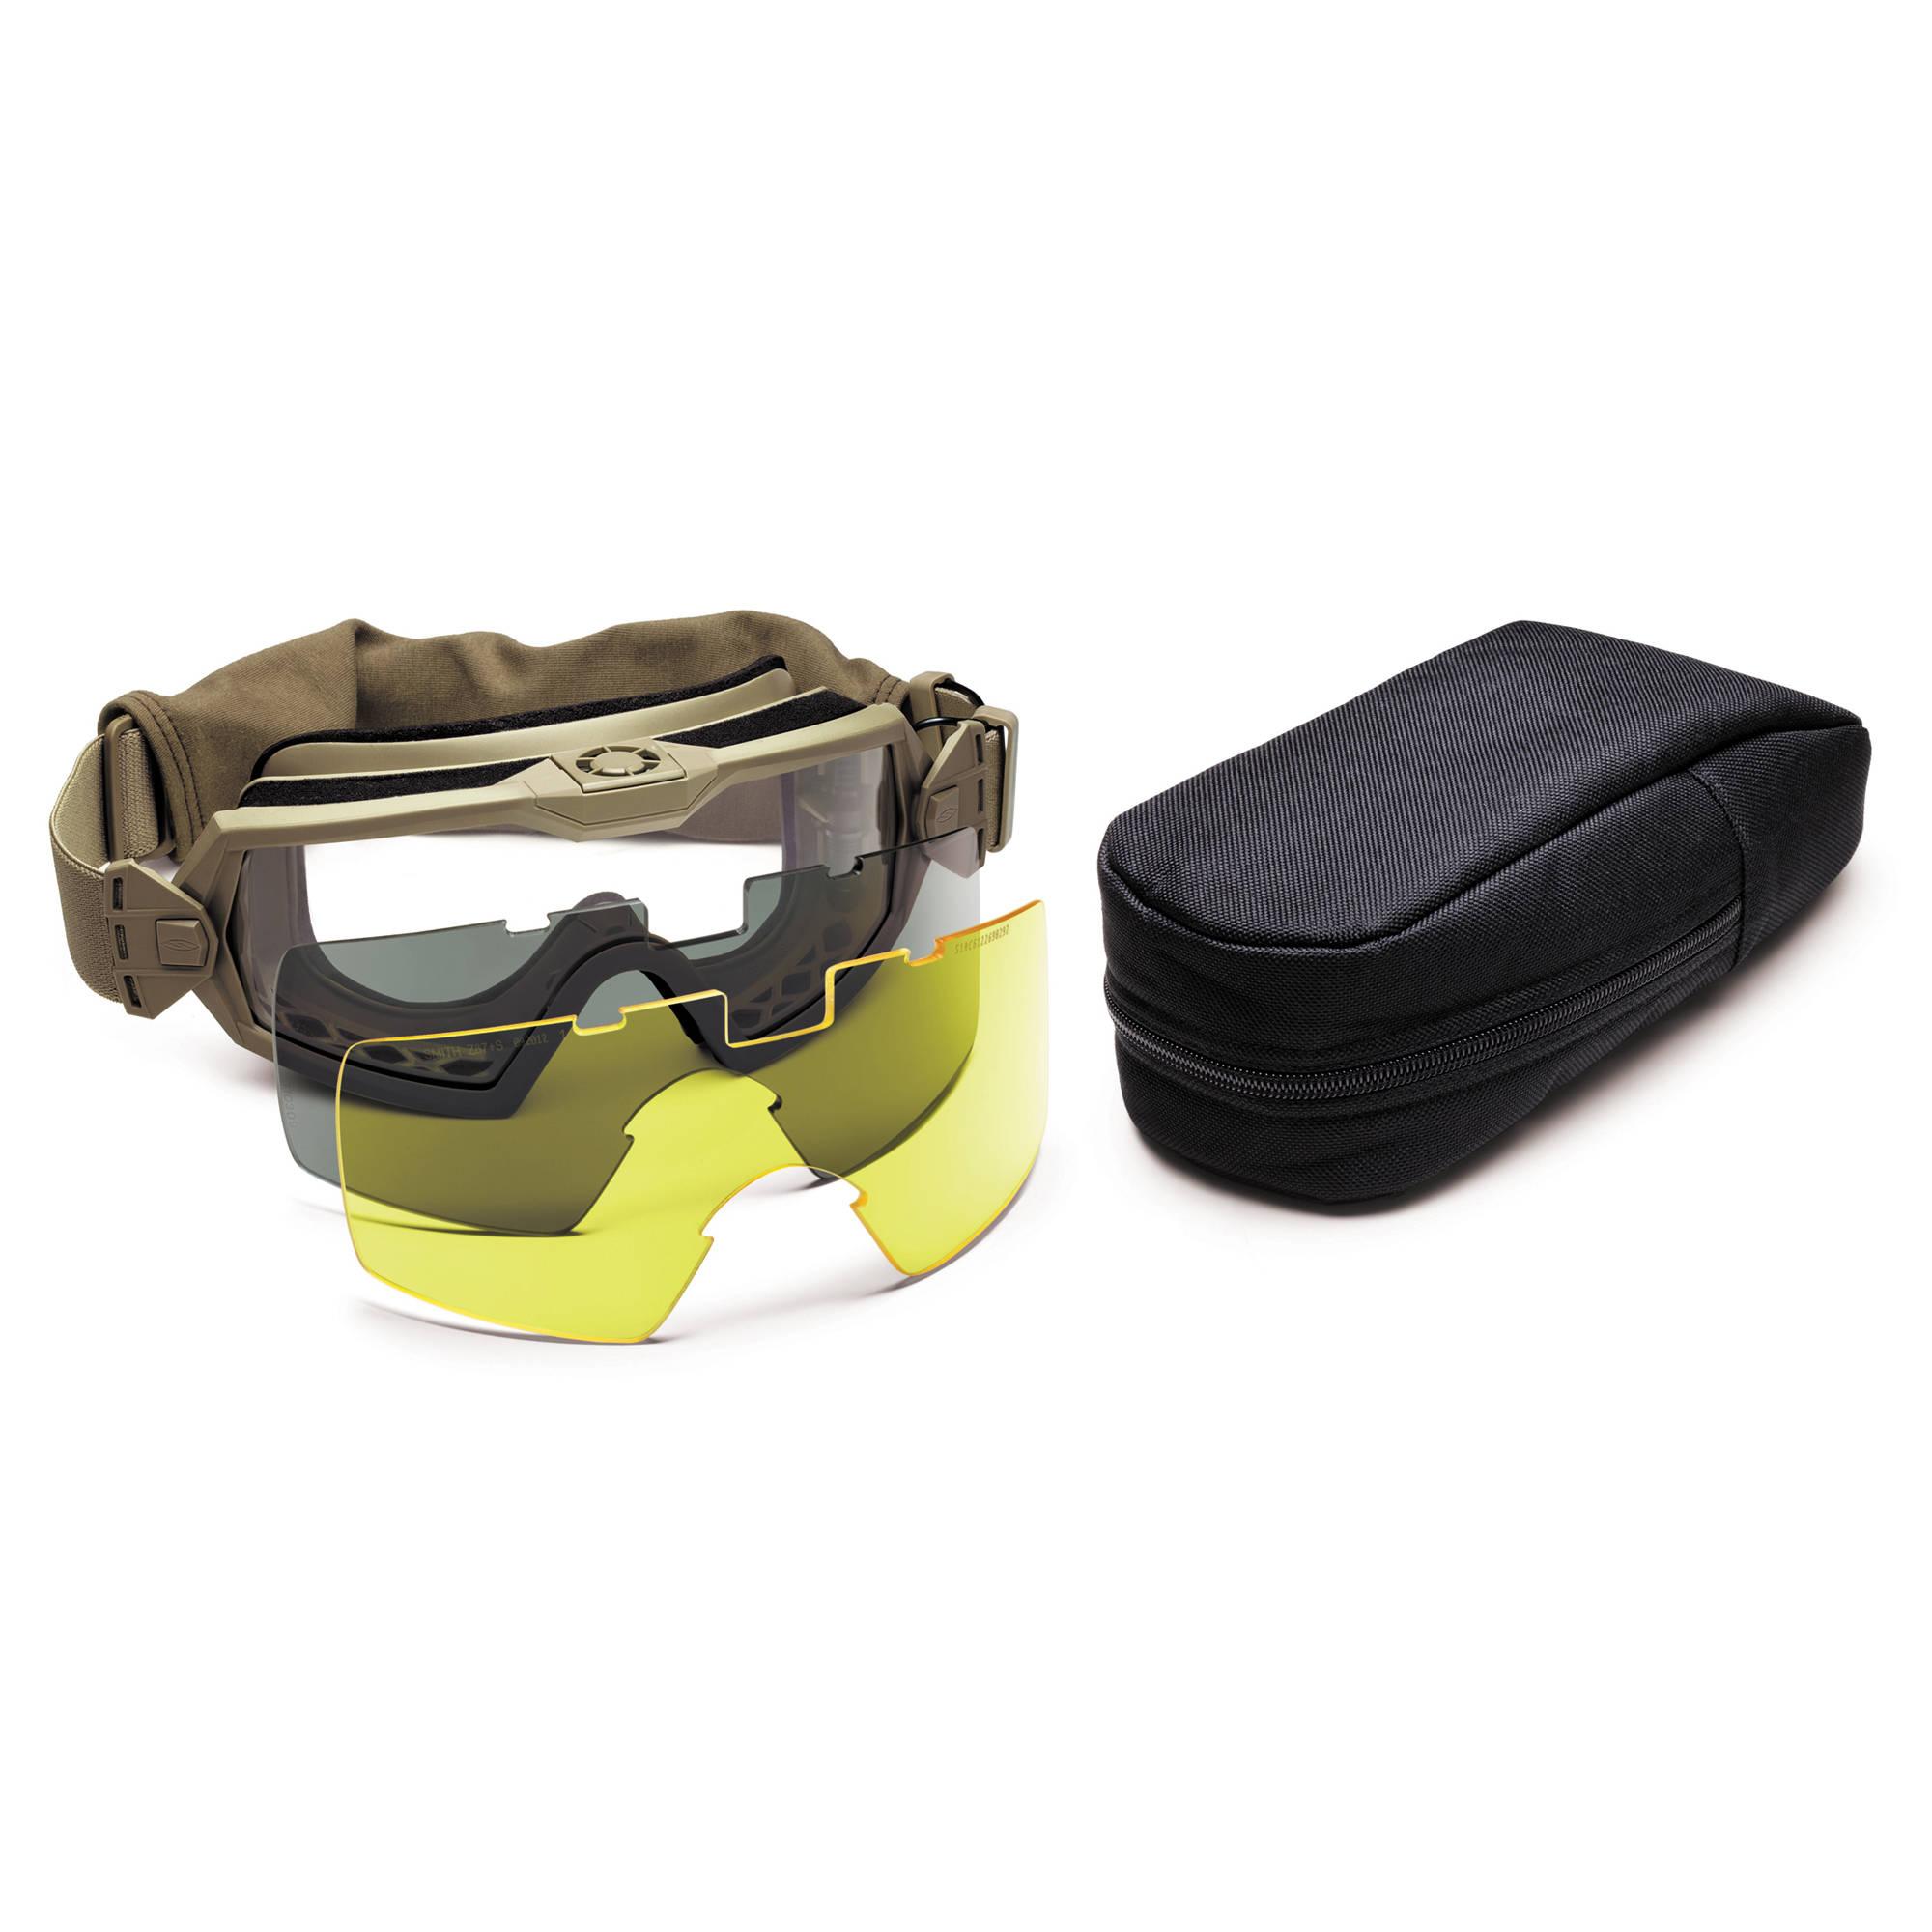 dd4752cd1b39e Smith Optics Outside the Wire (OTW) Turbo Fan Tactical Goggle - Field Kit  (Tan 499)